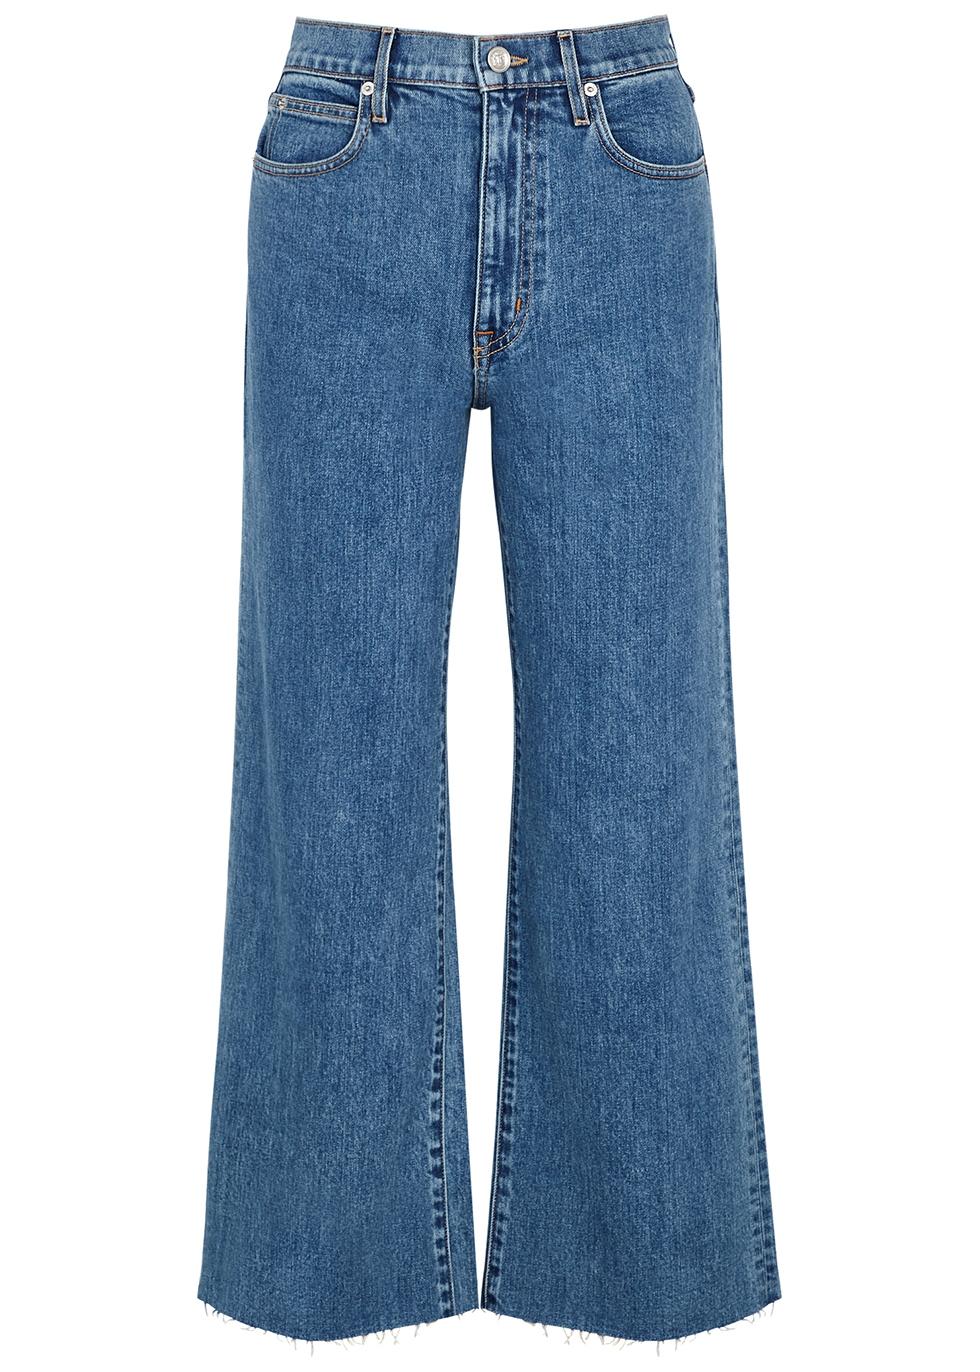 Grace blue wide-leg cropped jeans